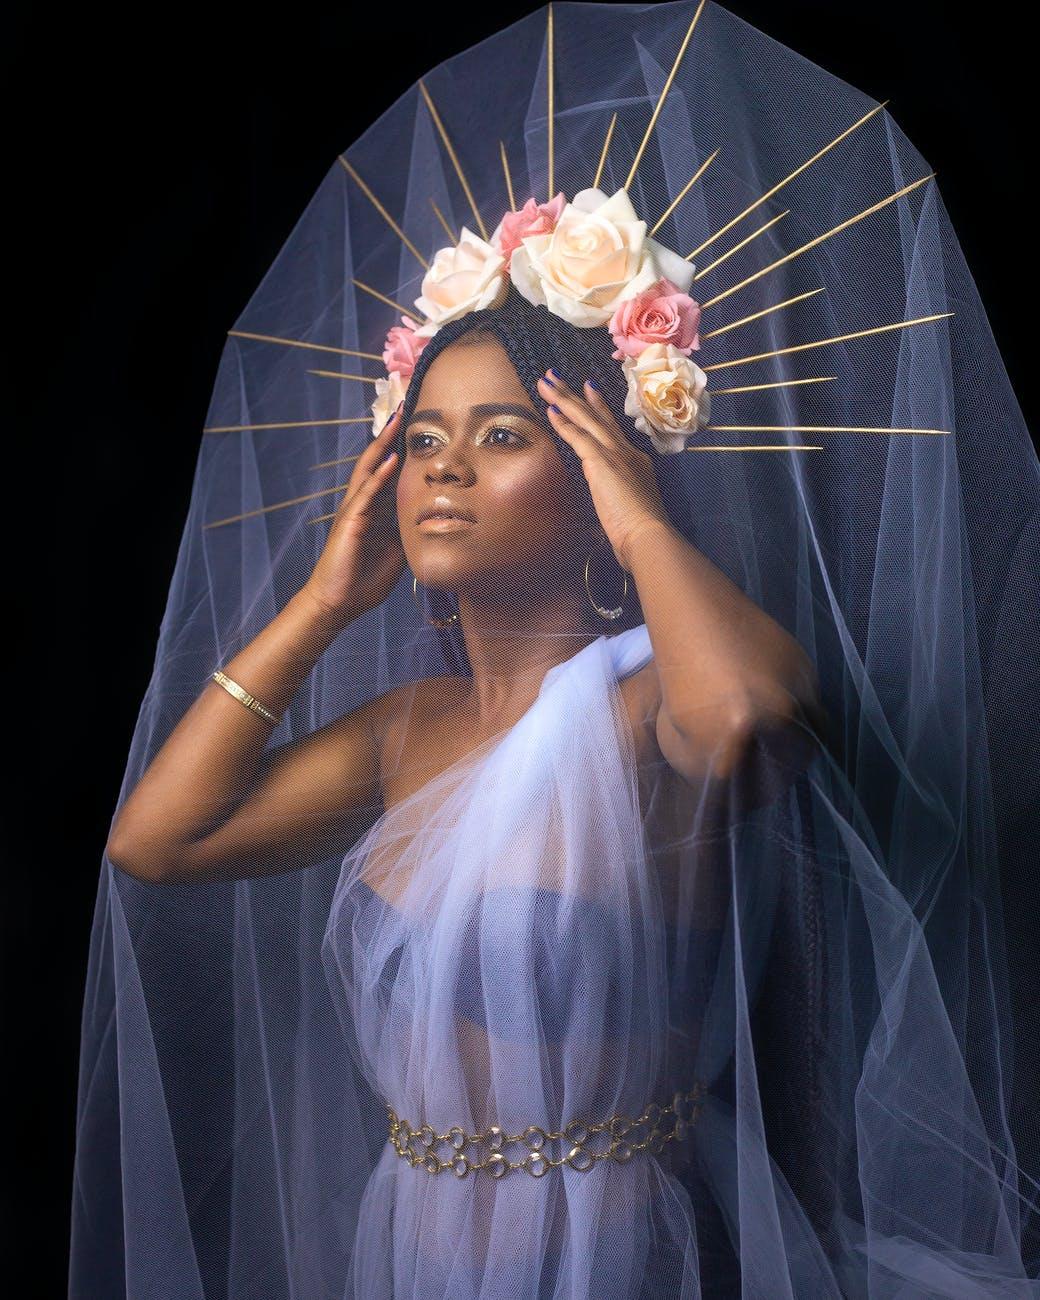 beautiful ethnic woman with translucent fabric